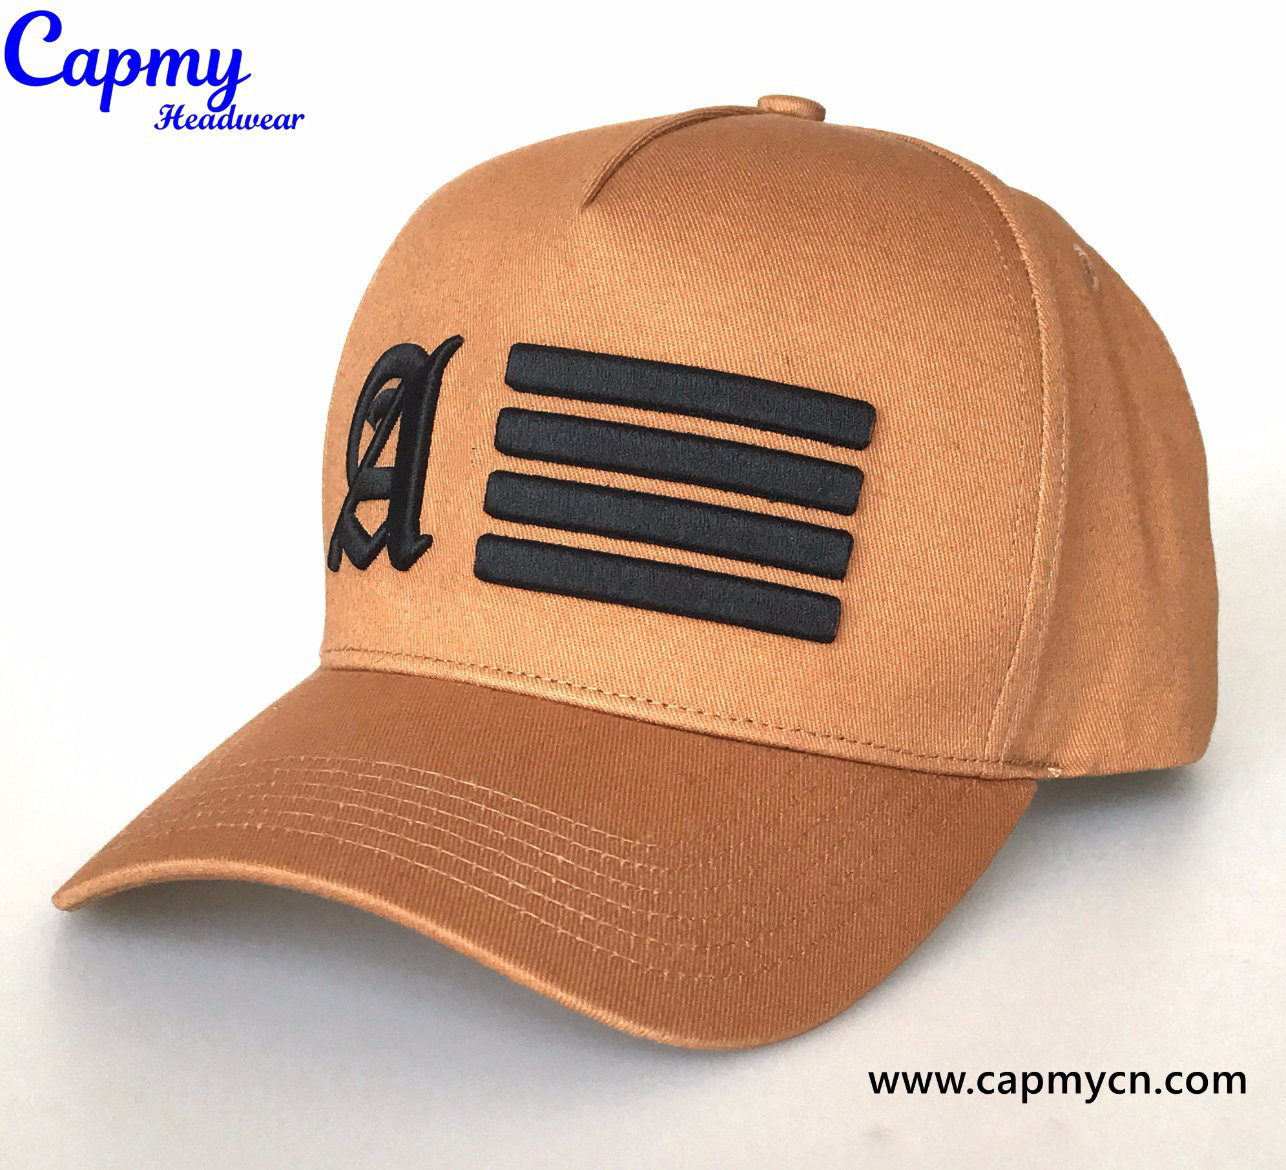 Merry Christmas Unisex Washed Twill Baseball Cap Adjustable Peaked Sandwich Hat